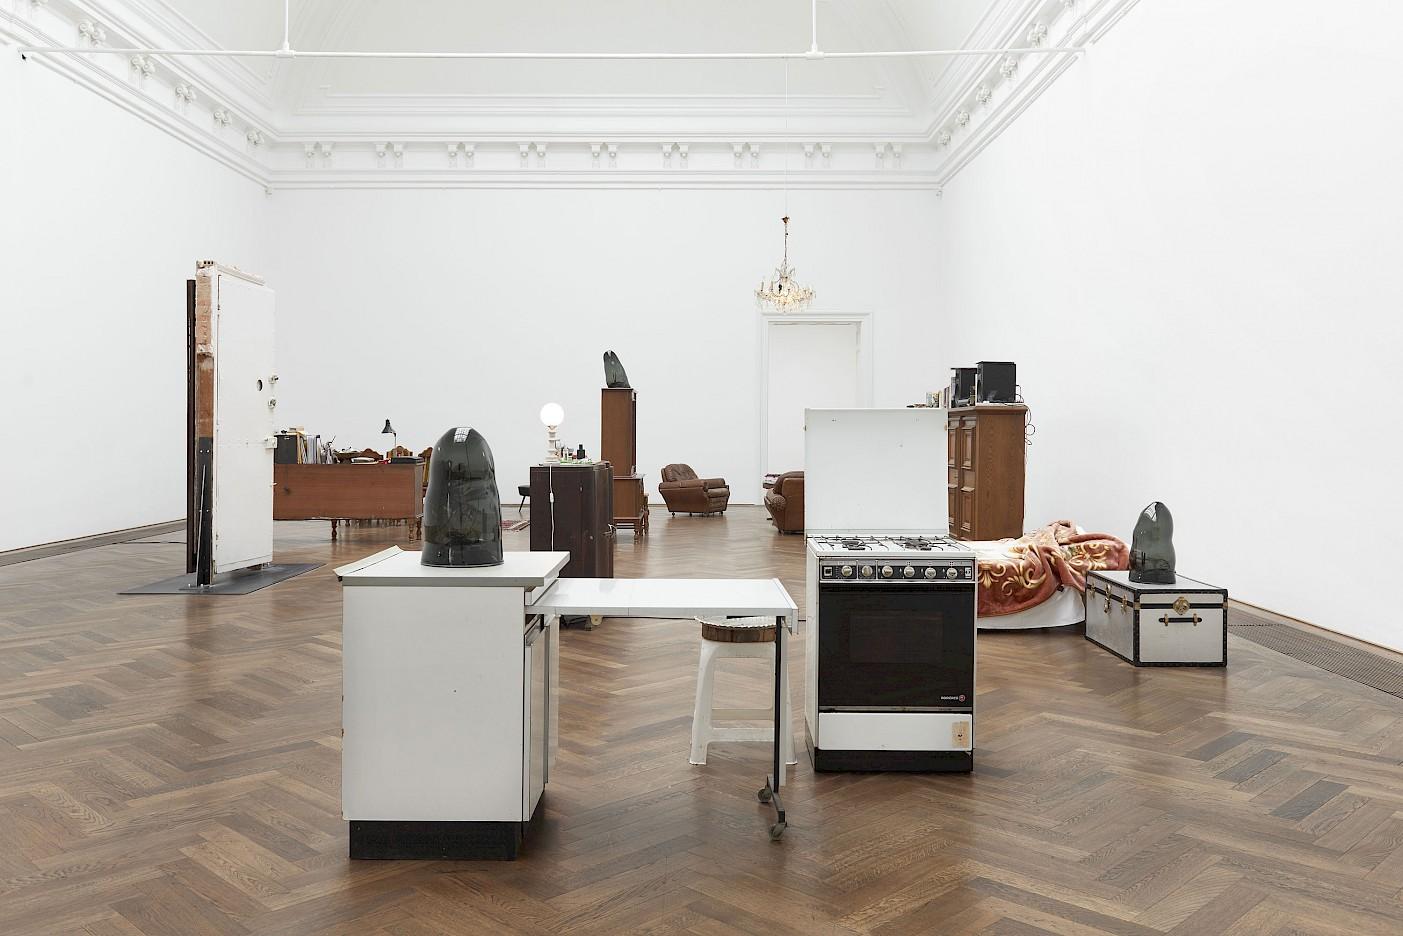 Credit: Installation view, Lydia Ourahmane, Barzakh, Kunsthalle Basel, 2021. Photo: Philipp Hänger / Kunsthalle Basel